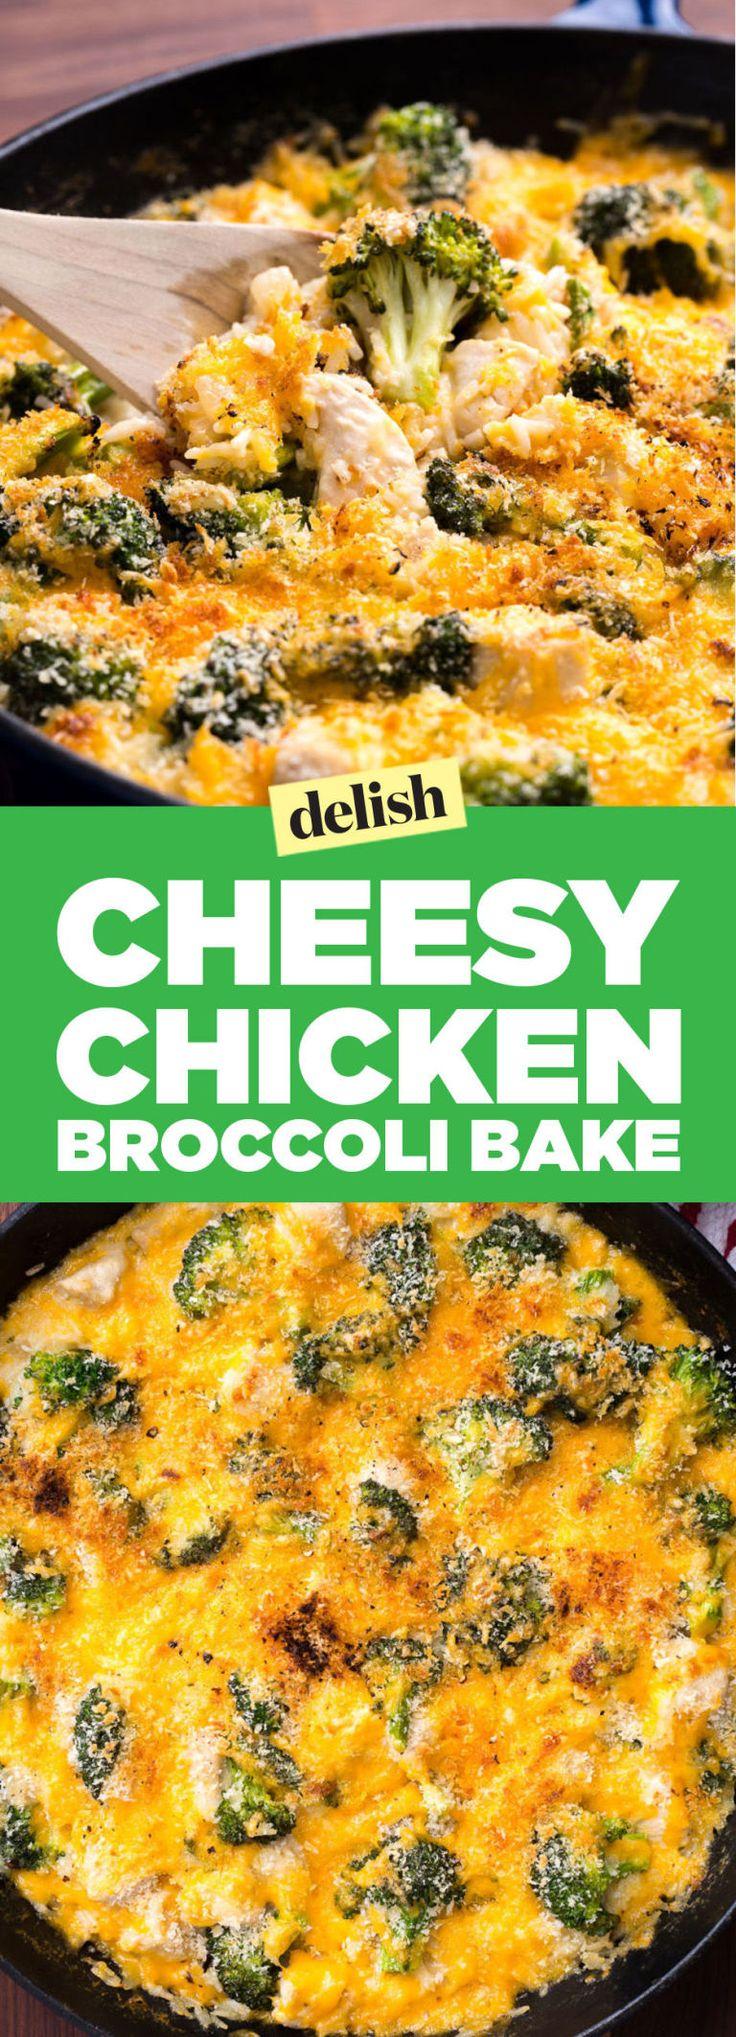 Cheesy Chicken Broccoli Bake